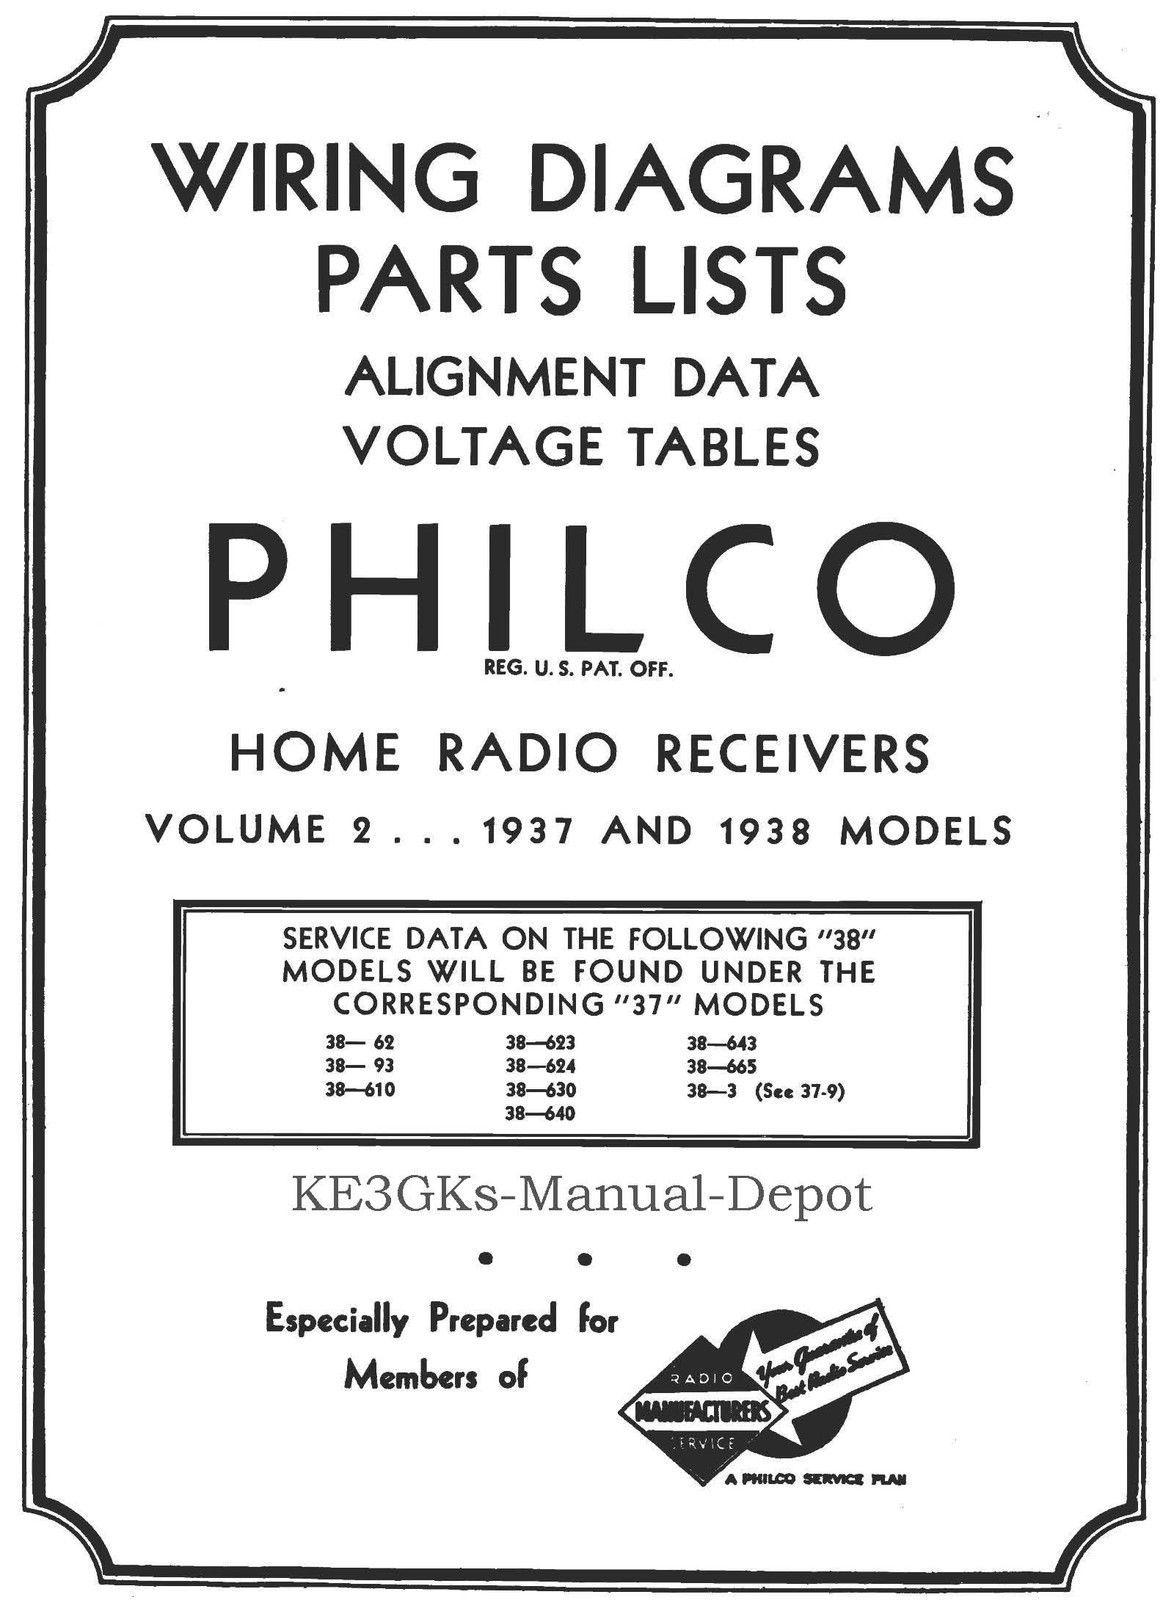 Philco Home Radio Receivers Service Data Cdrom